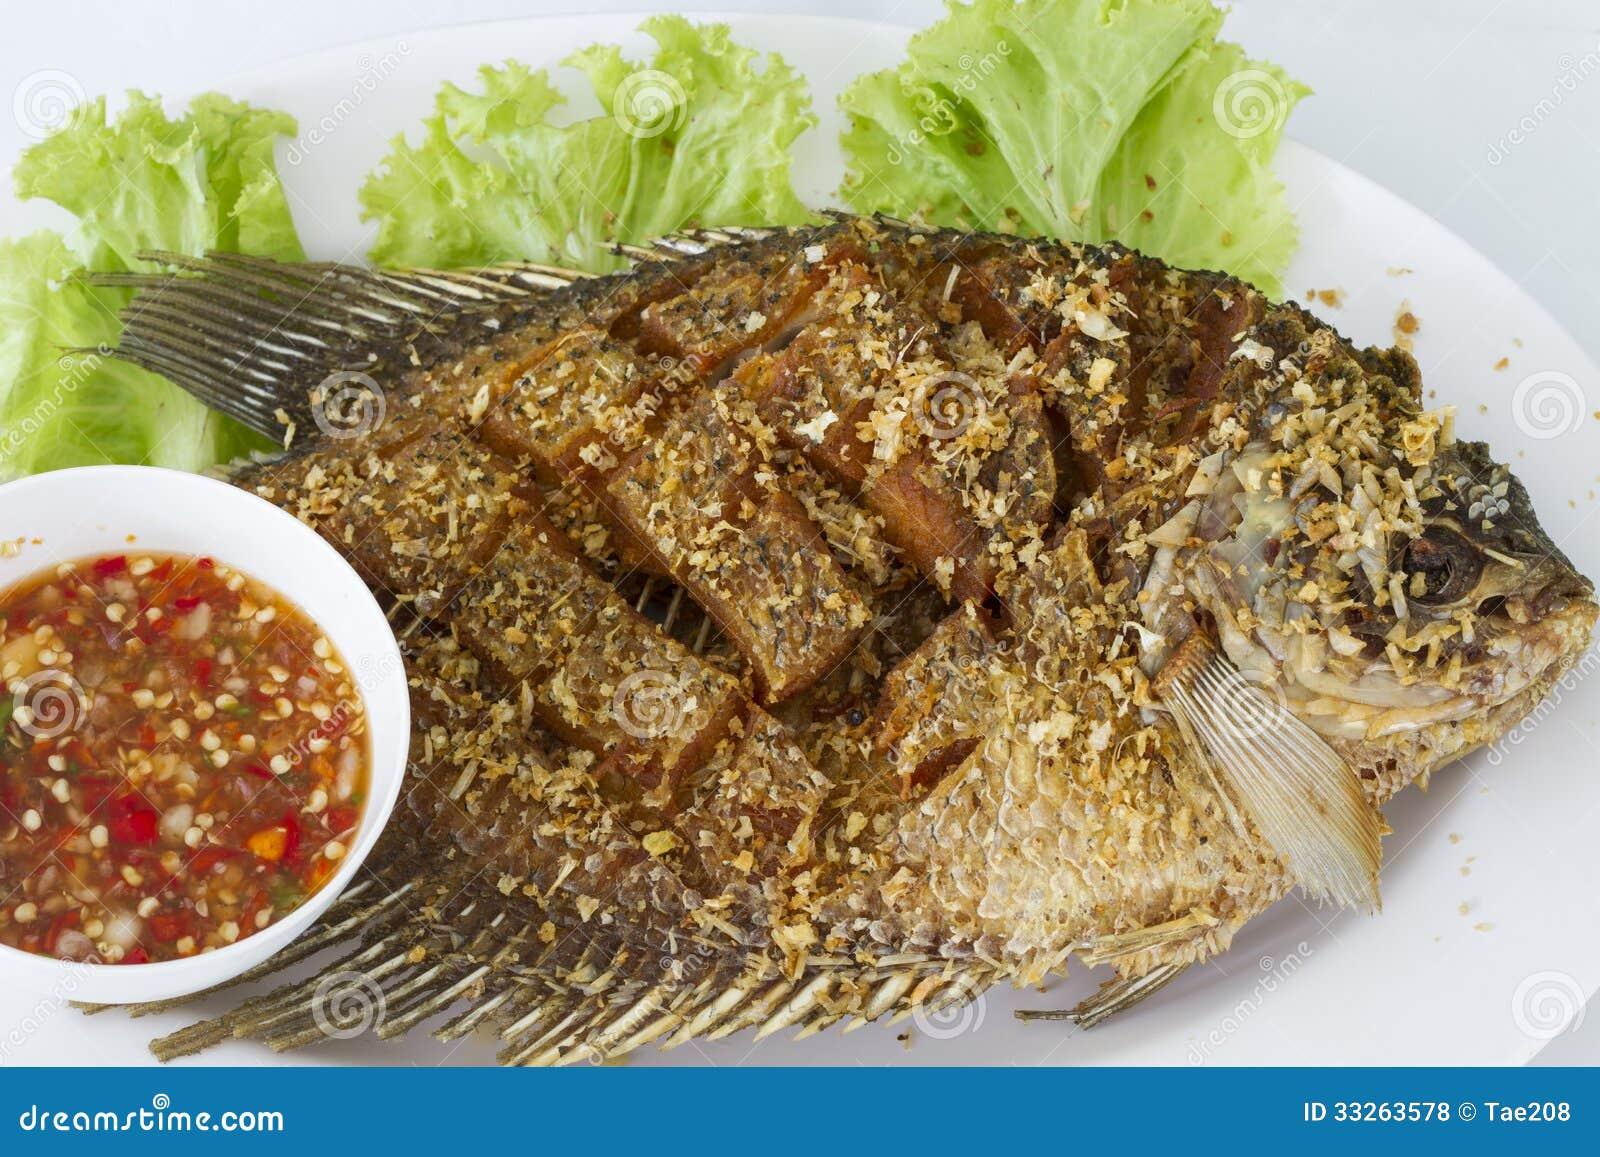 Deep Fried Red Tilapia Fish Royalty Free Stock Photos - Image ...